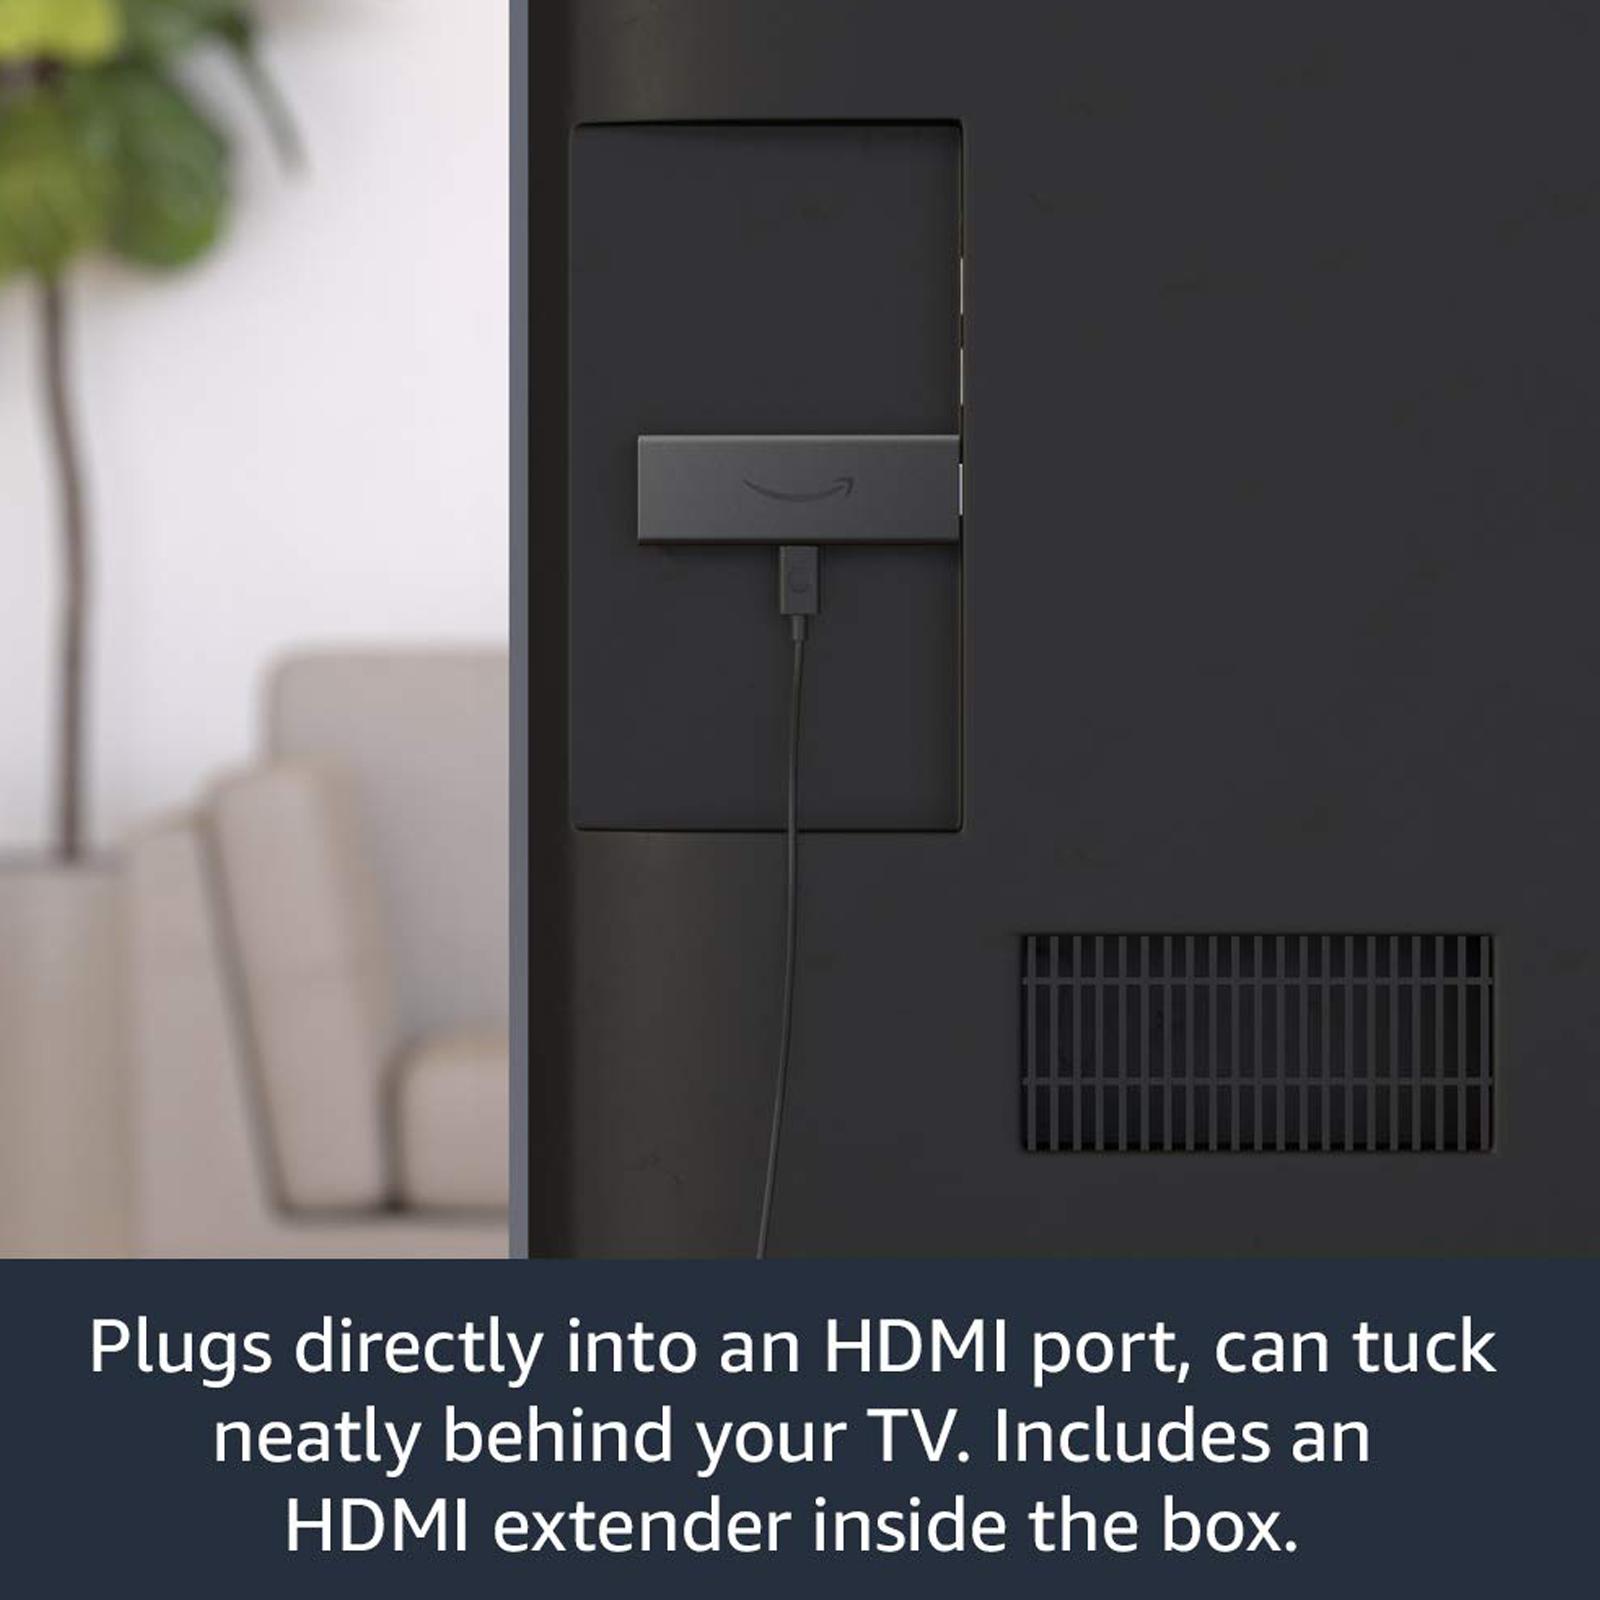 Amazon Fire TV Stick 3rd Gen with Alexa Voice Remote (Quad Core Processor, B08C1KQRR5, Black) 6